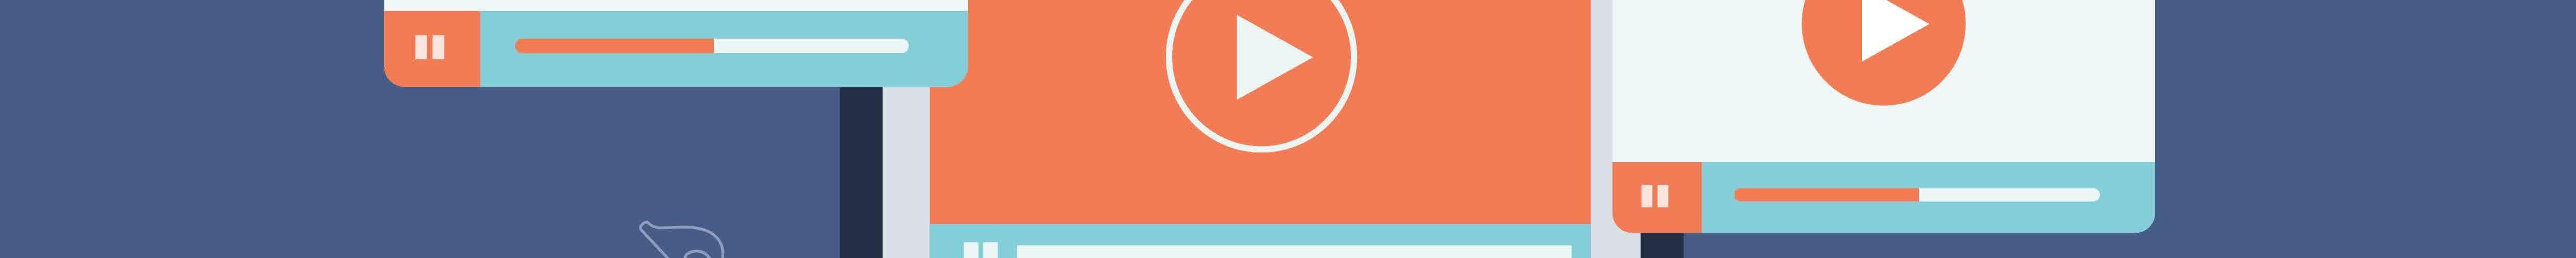 youre-foolish-for-ignoring-video-marketing